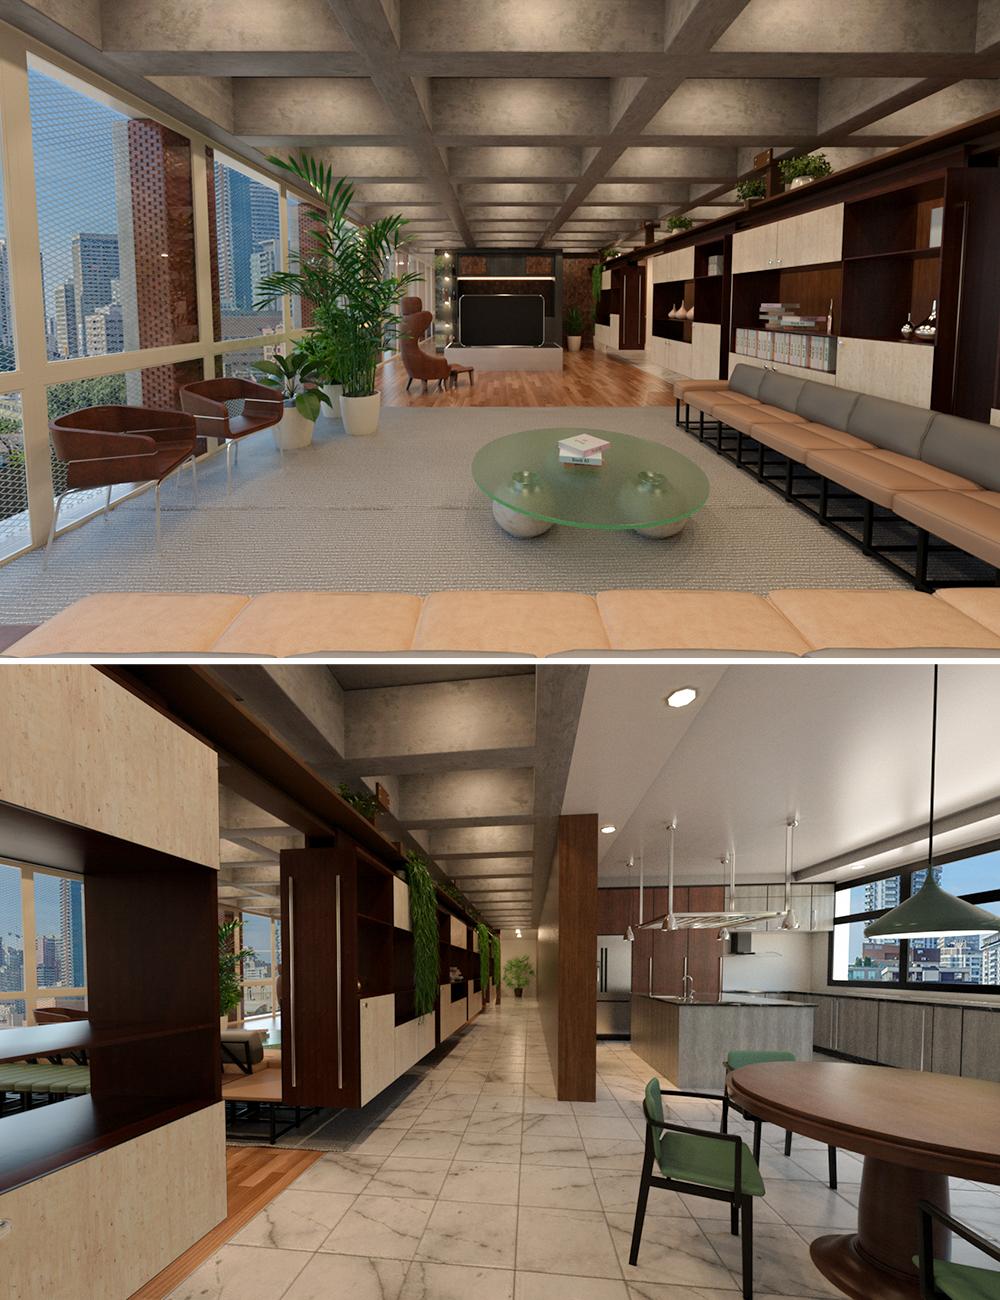 Tesla3dcorp Open Apartment by: Tesla3dCorp, 3D Models by Daz 3D